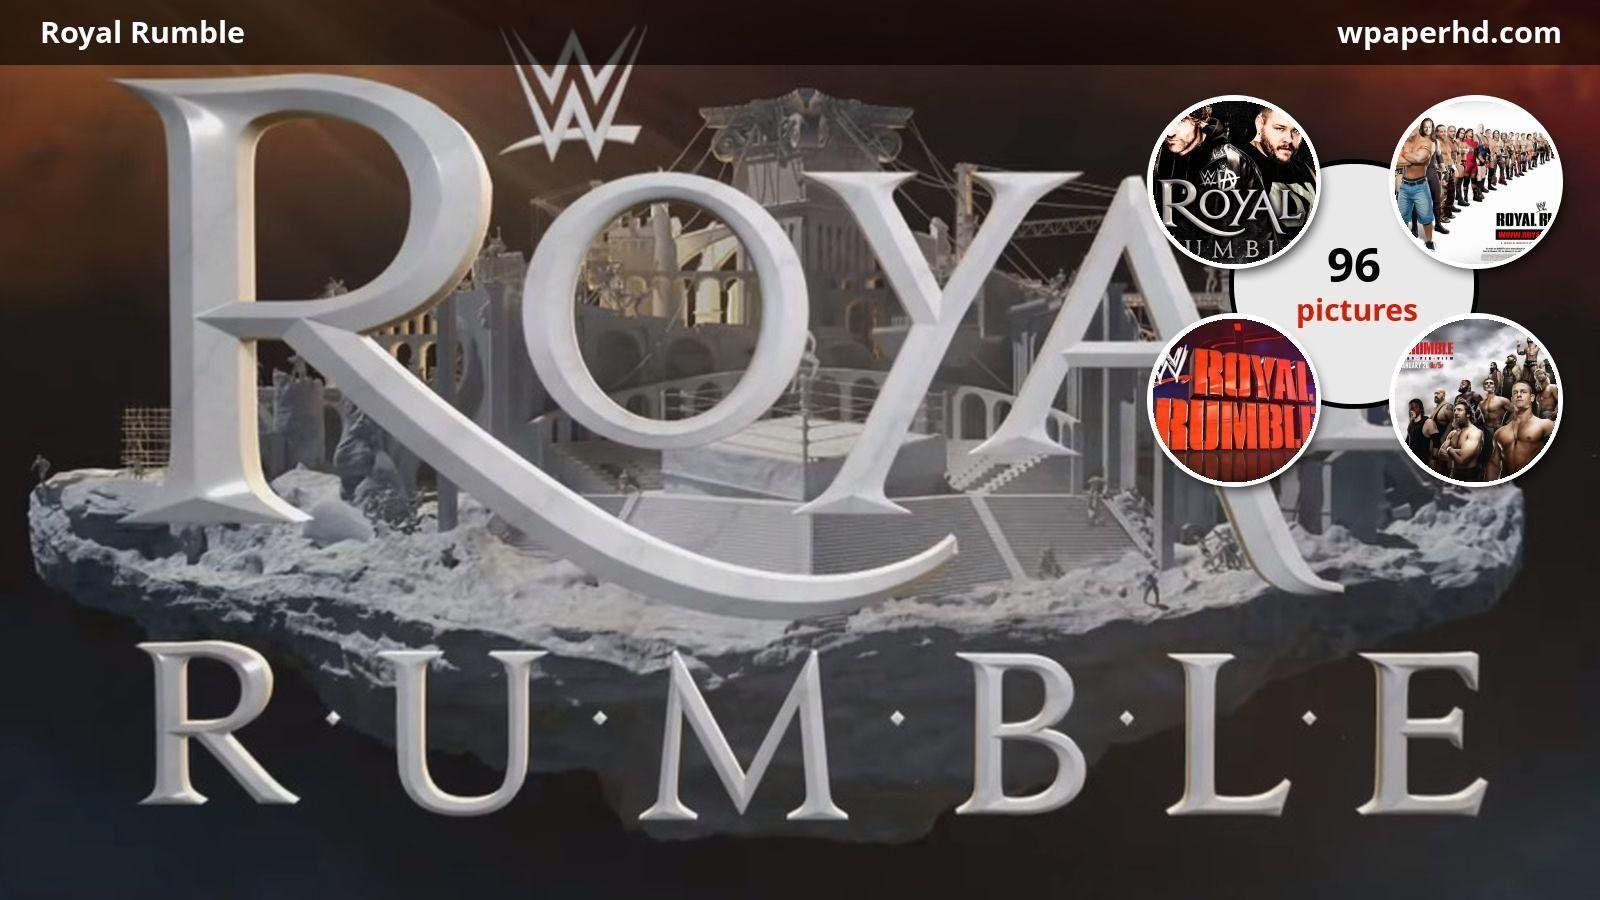 Royal Rumble Wallpapers (45+)